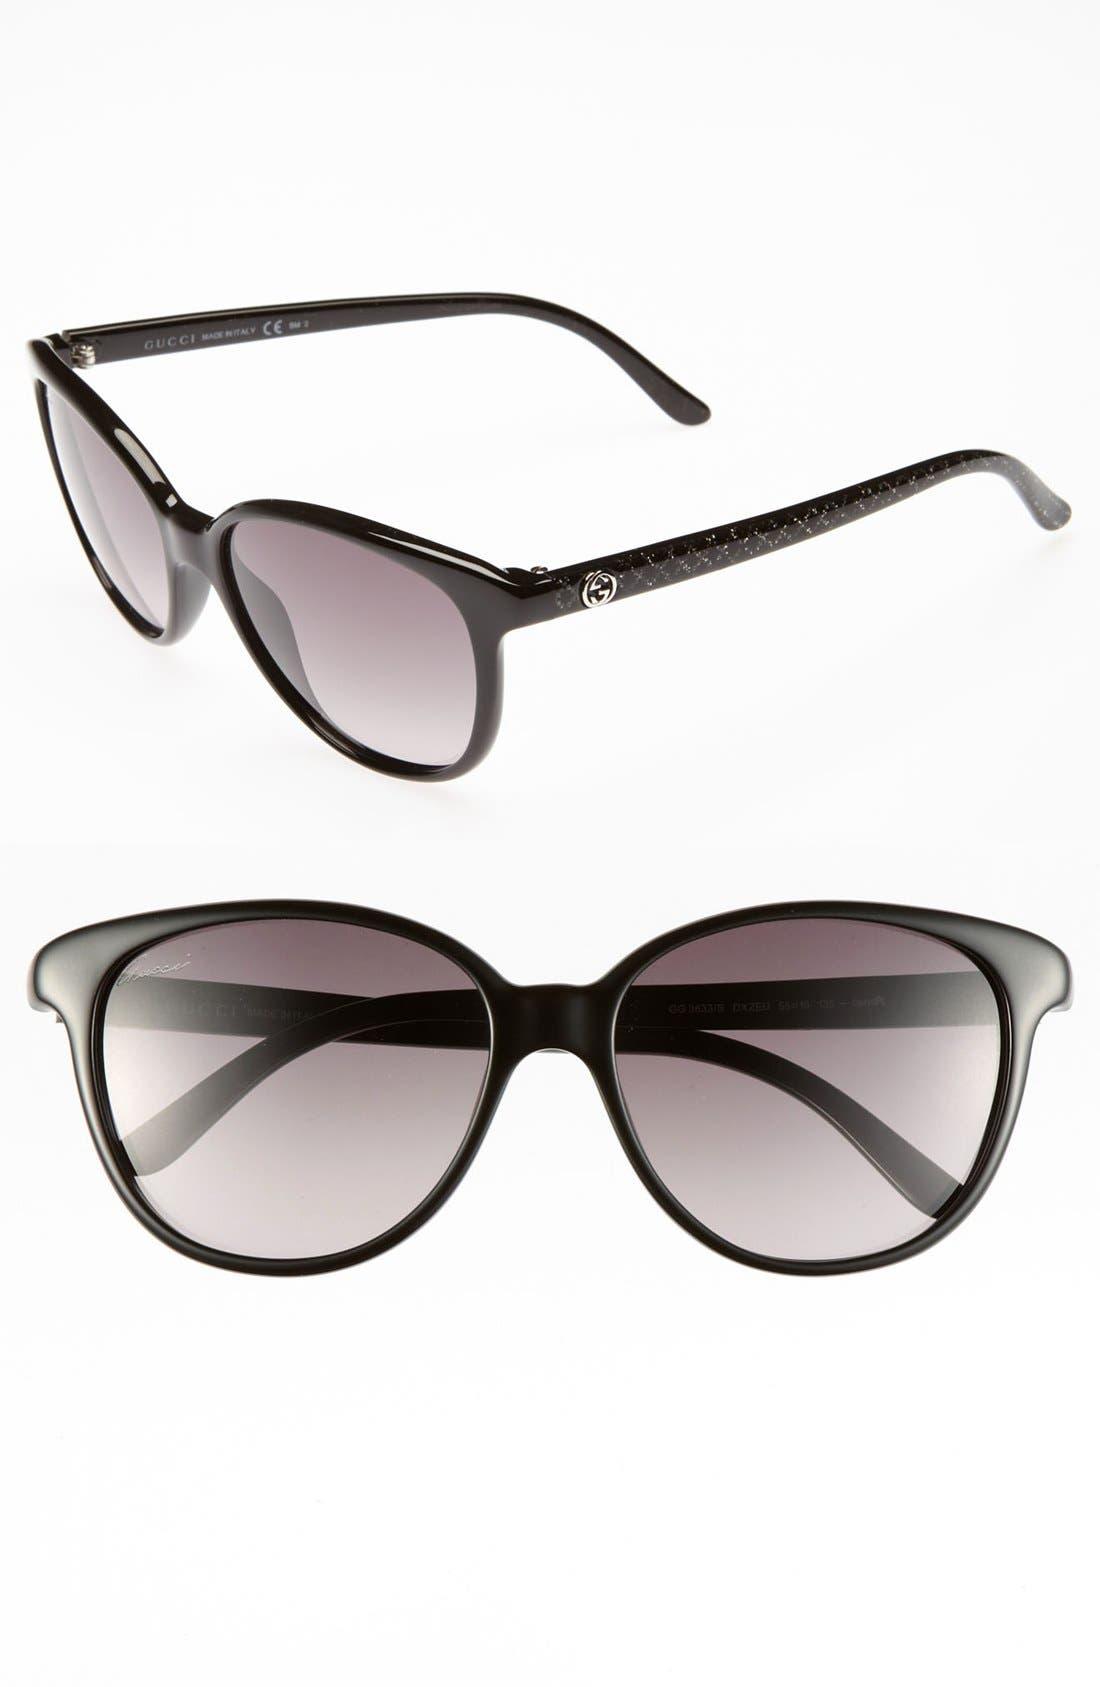 Alternate Image 1 Selected - Gucci 55mm Retro Sunglasses